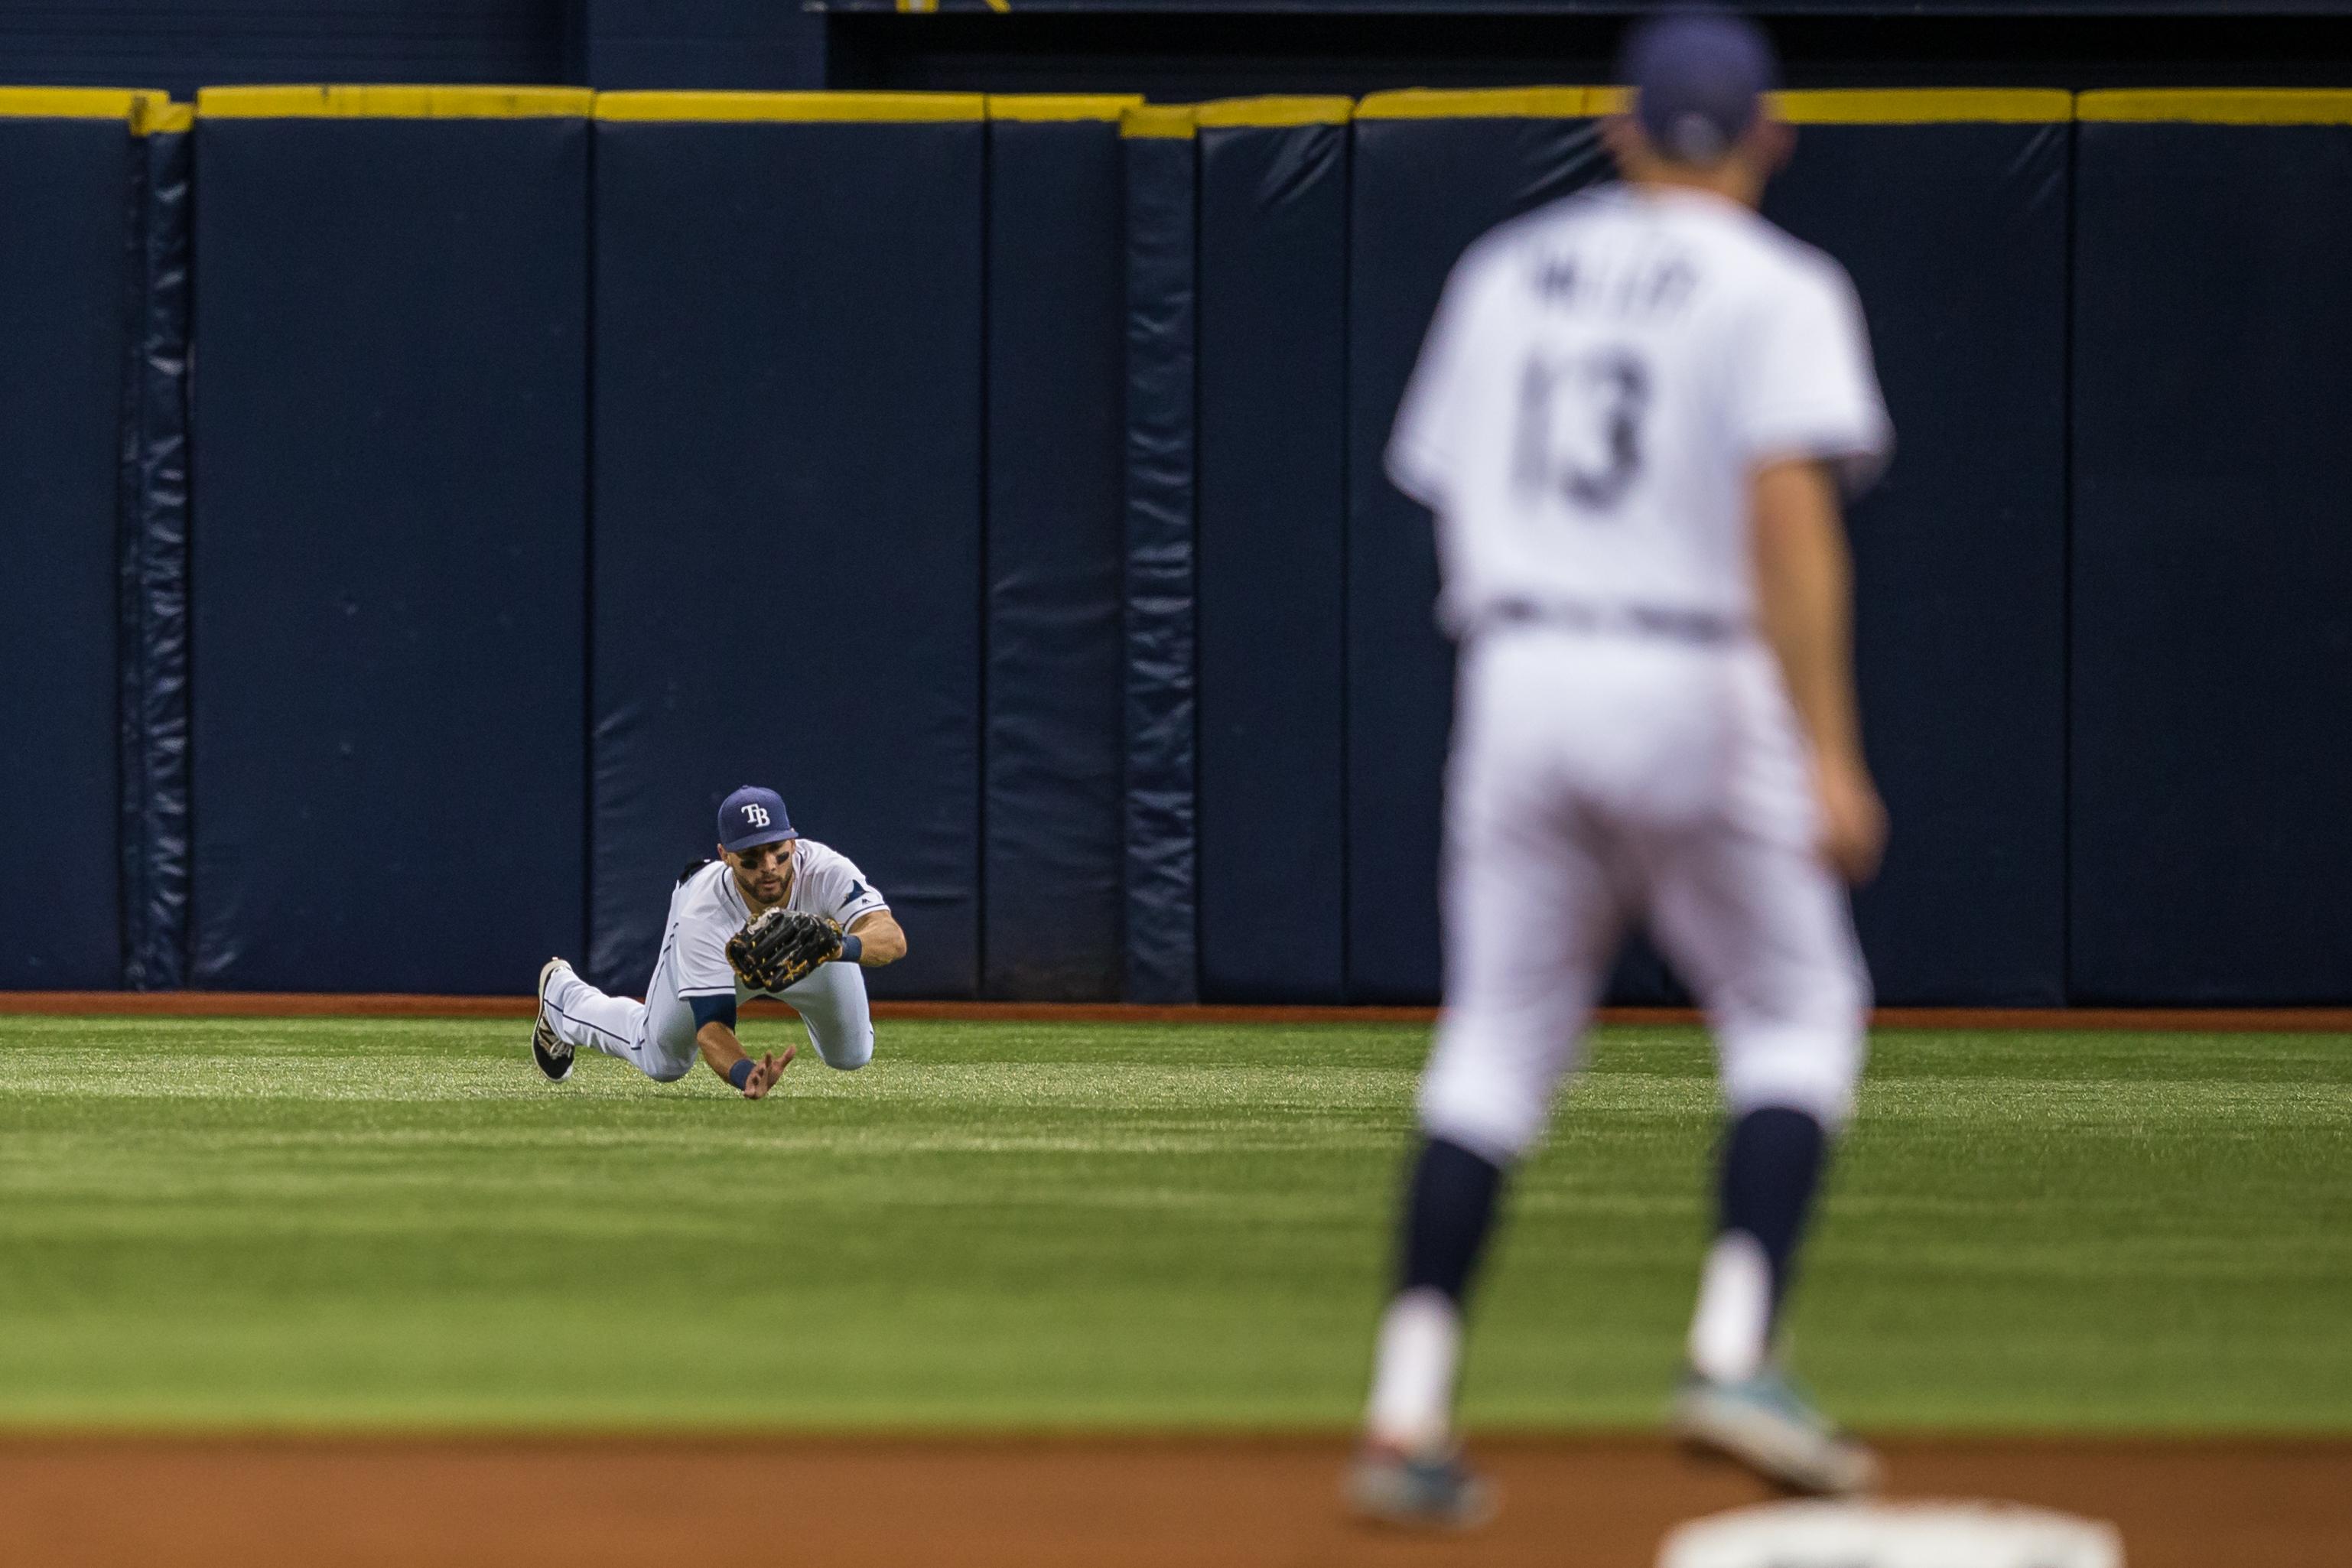 Rays' centerfielder Kevin Kiermaier leaves his feet to make a catch./TRAVIS PENDERGRASS